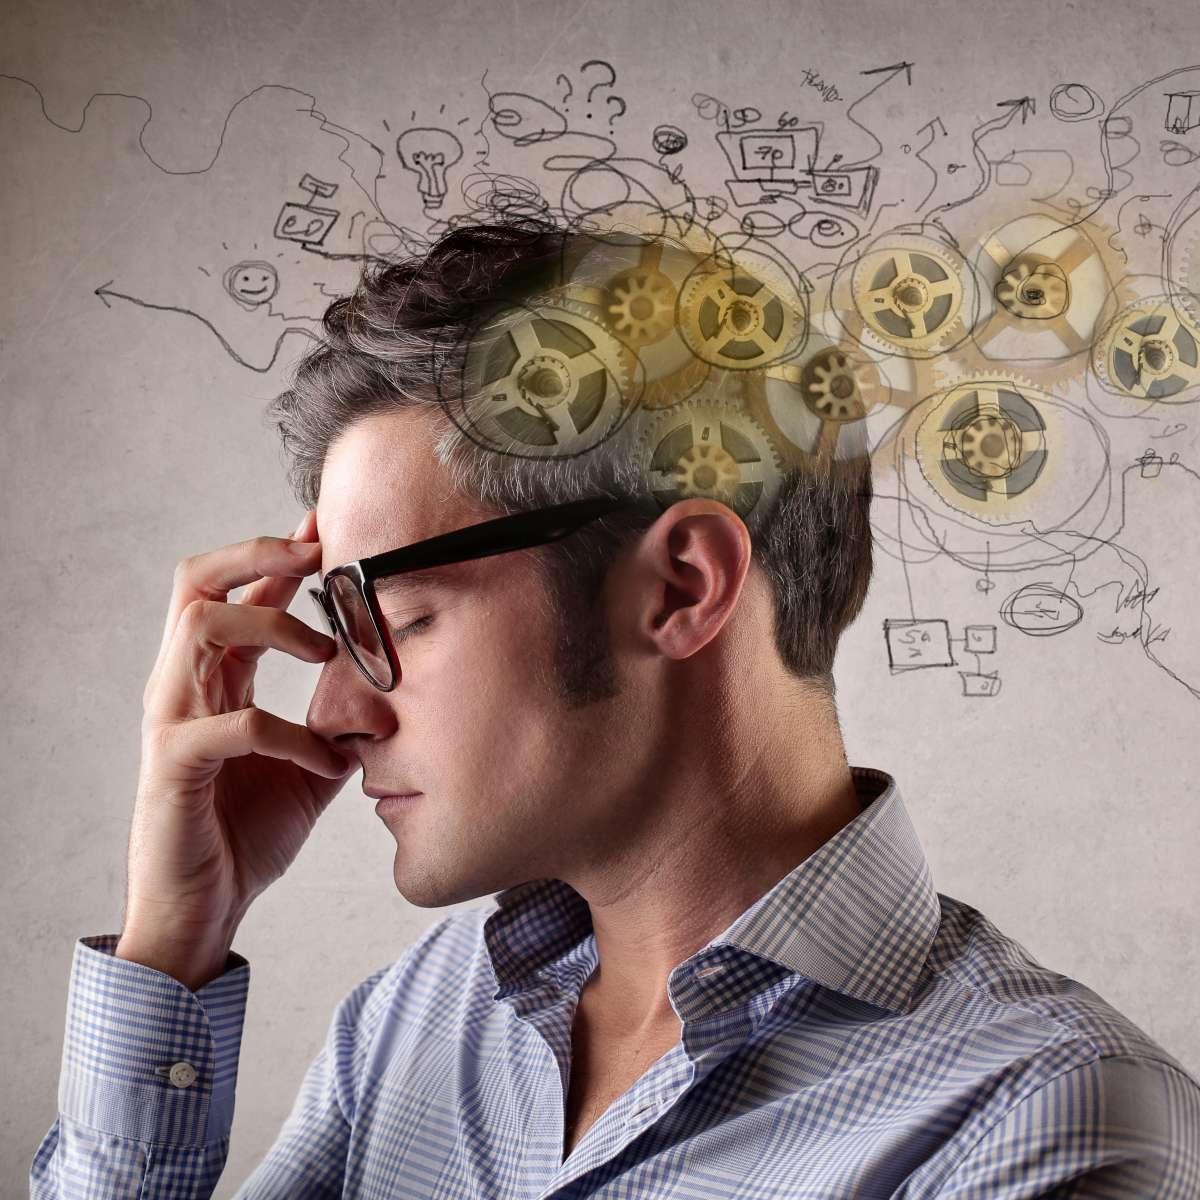 curso de neuroliderazgo - Elige tu curso